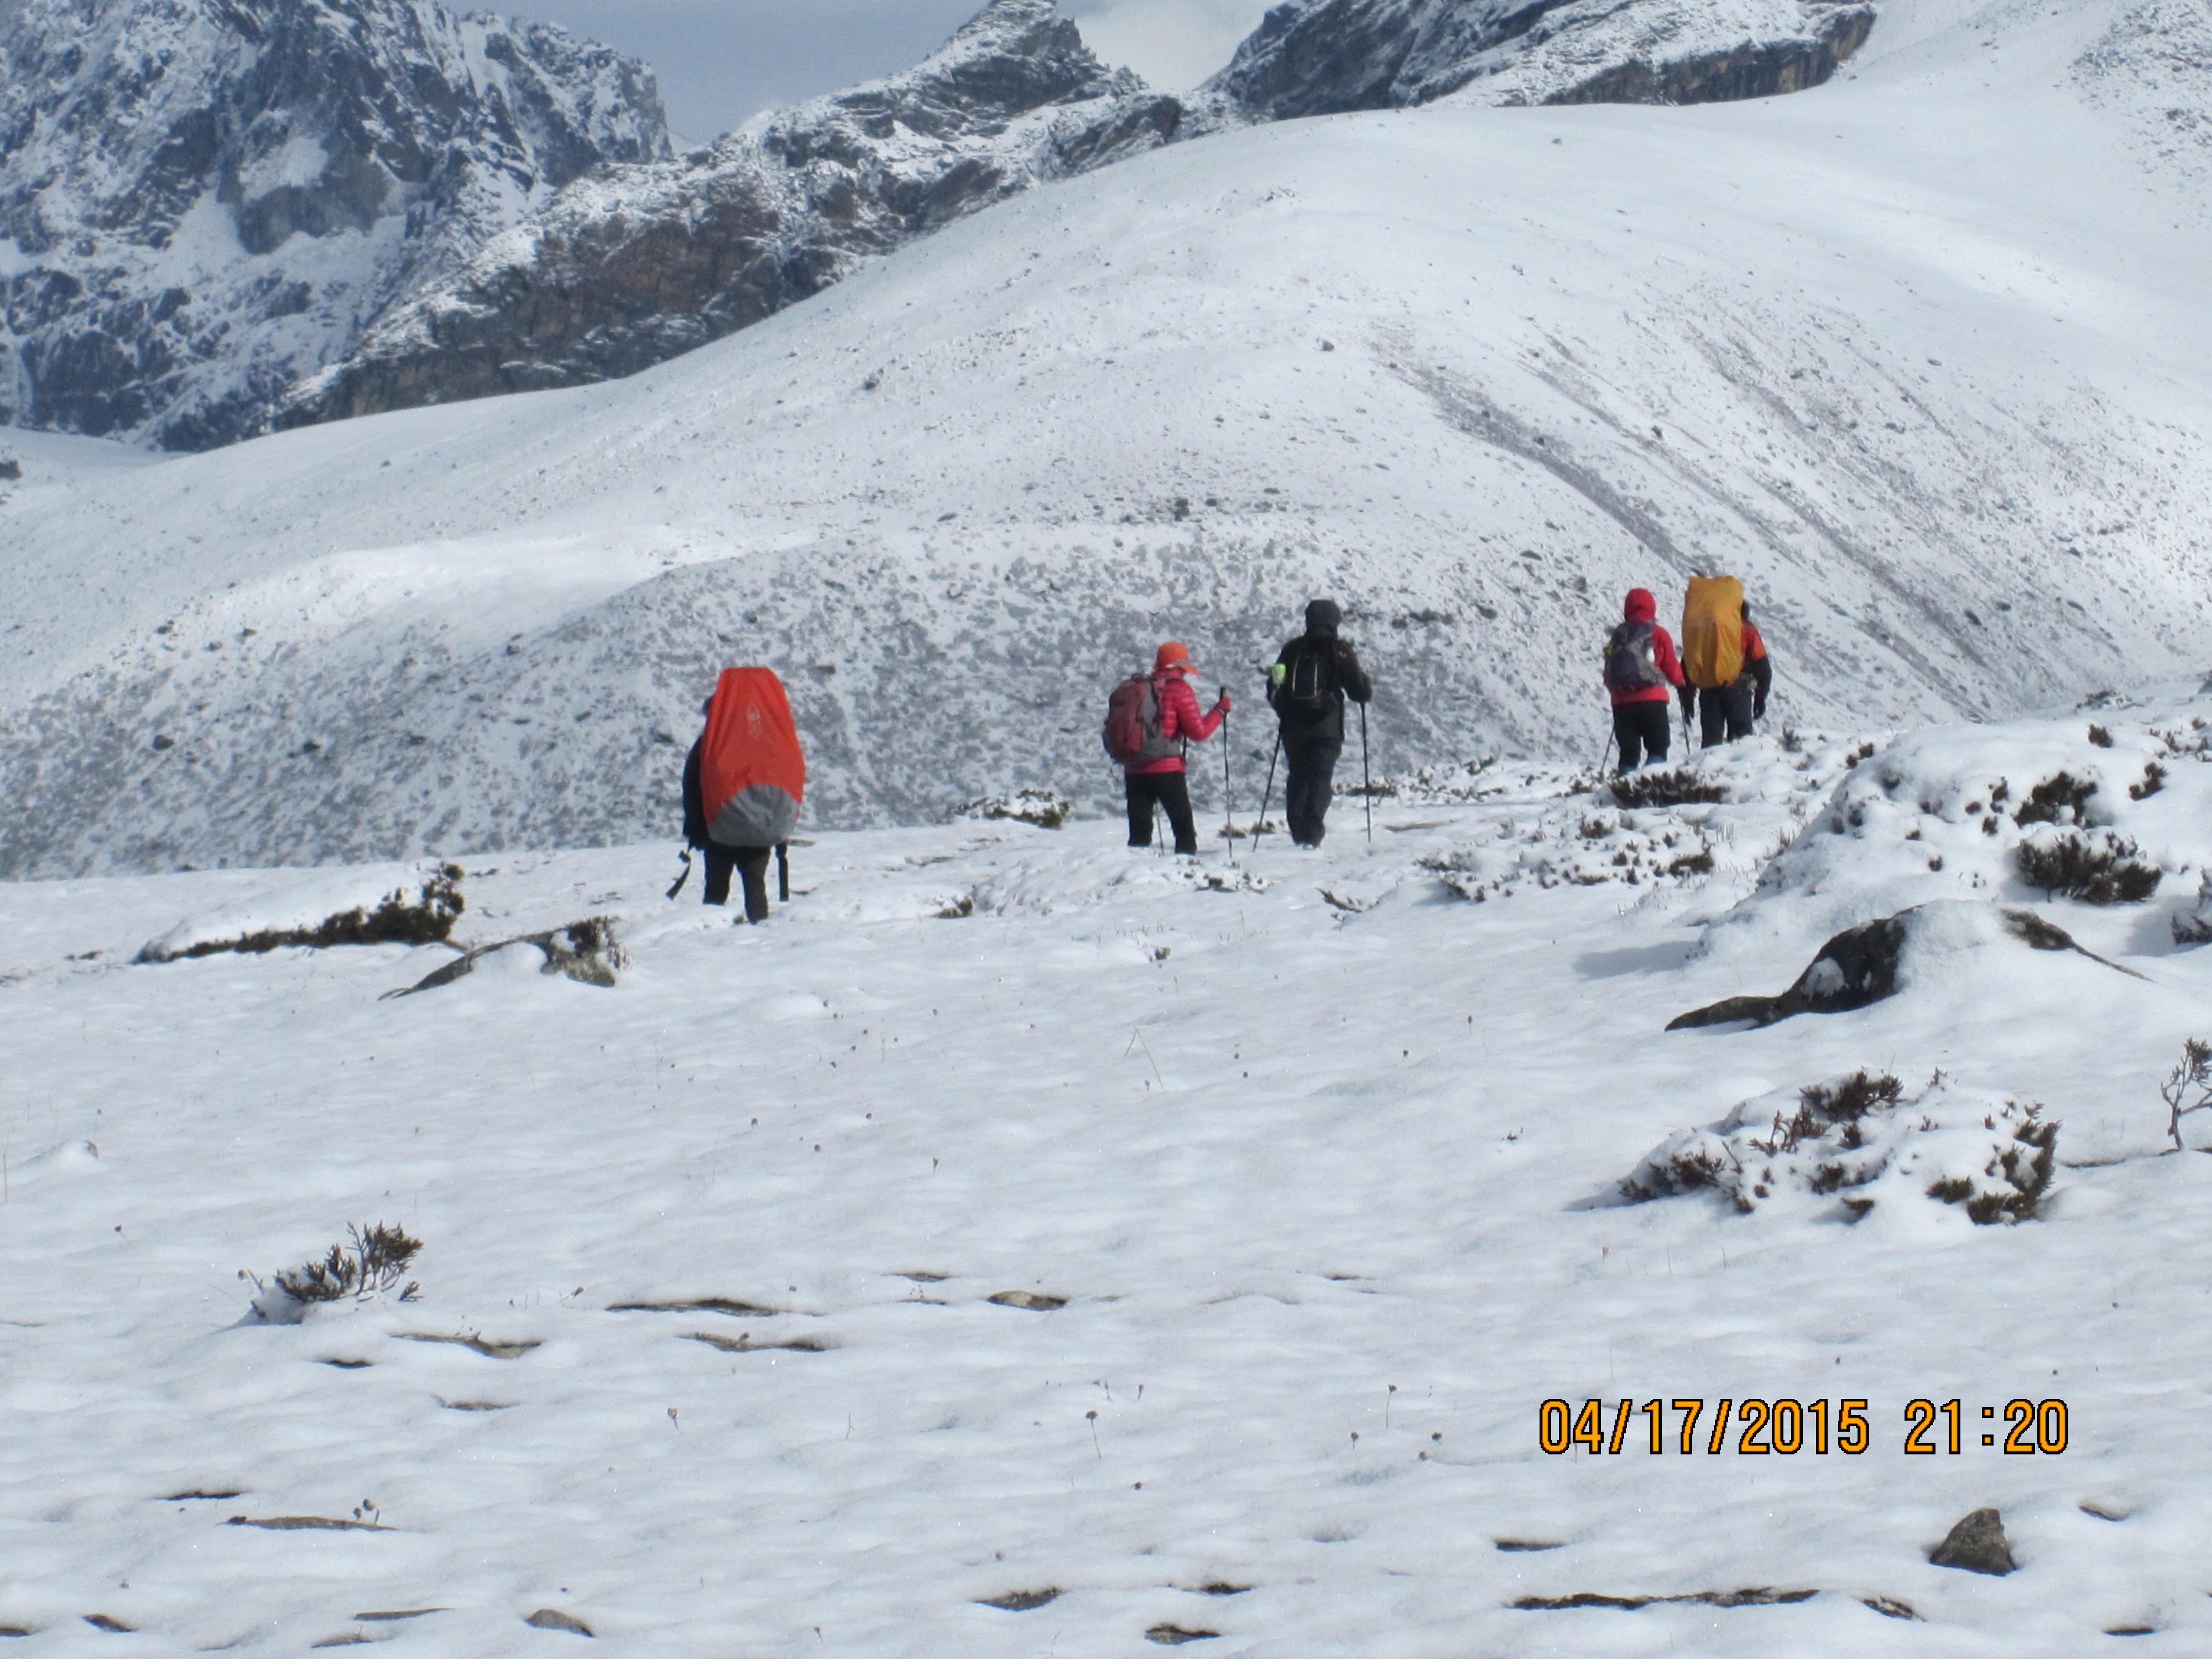 Everest as' Snow bank' trek